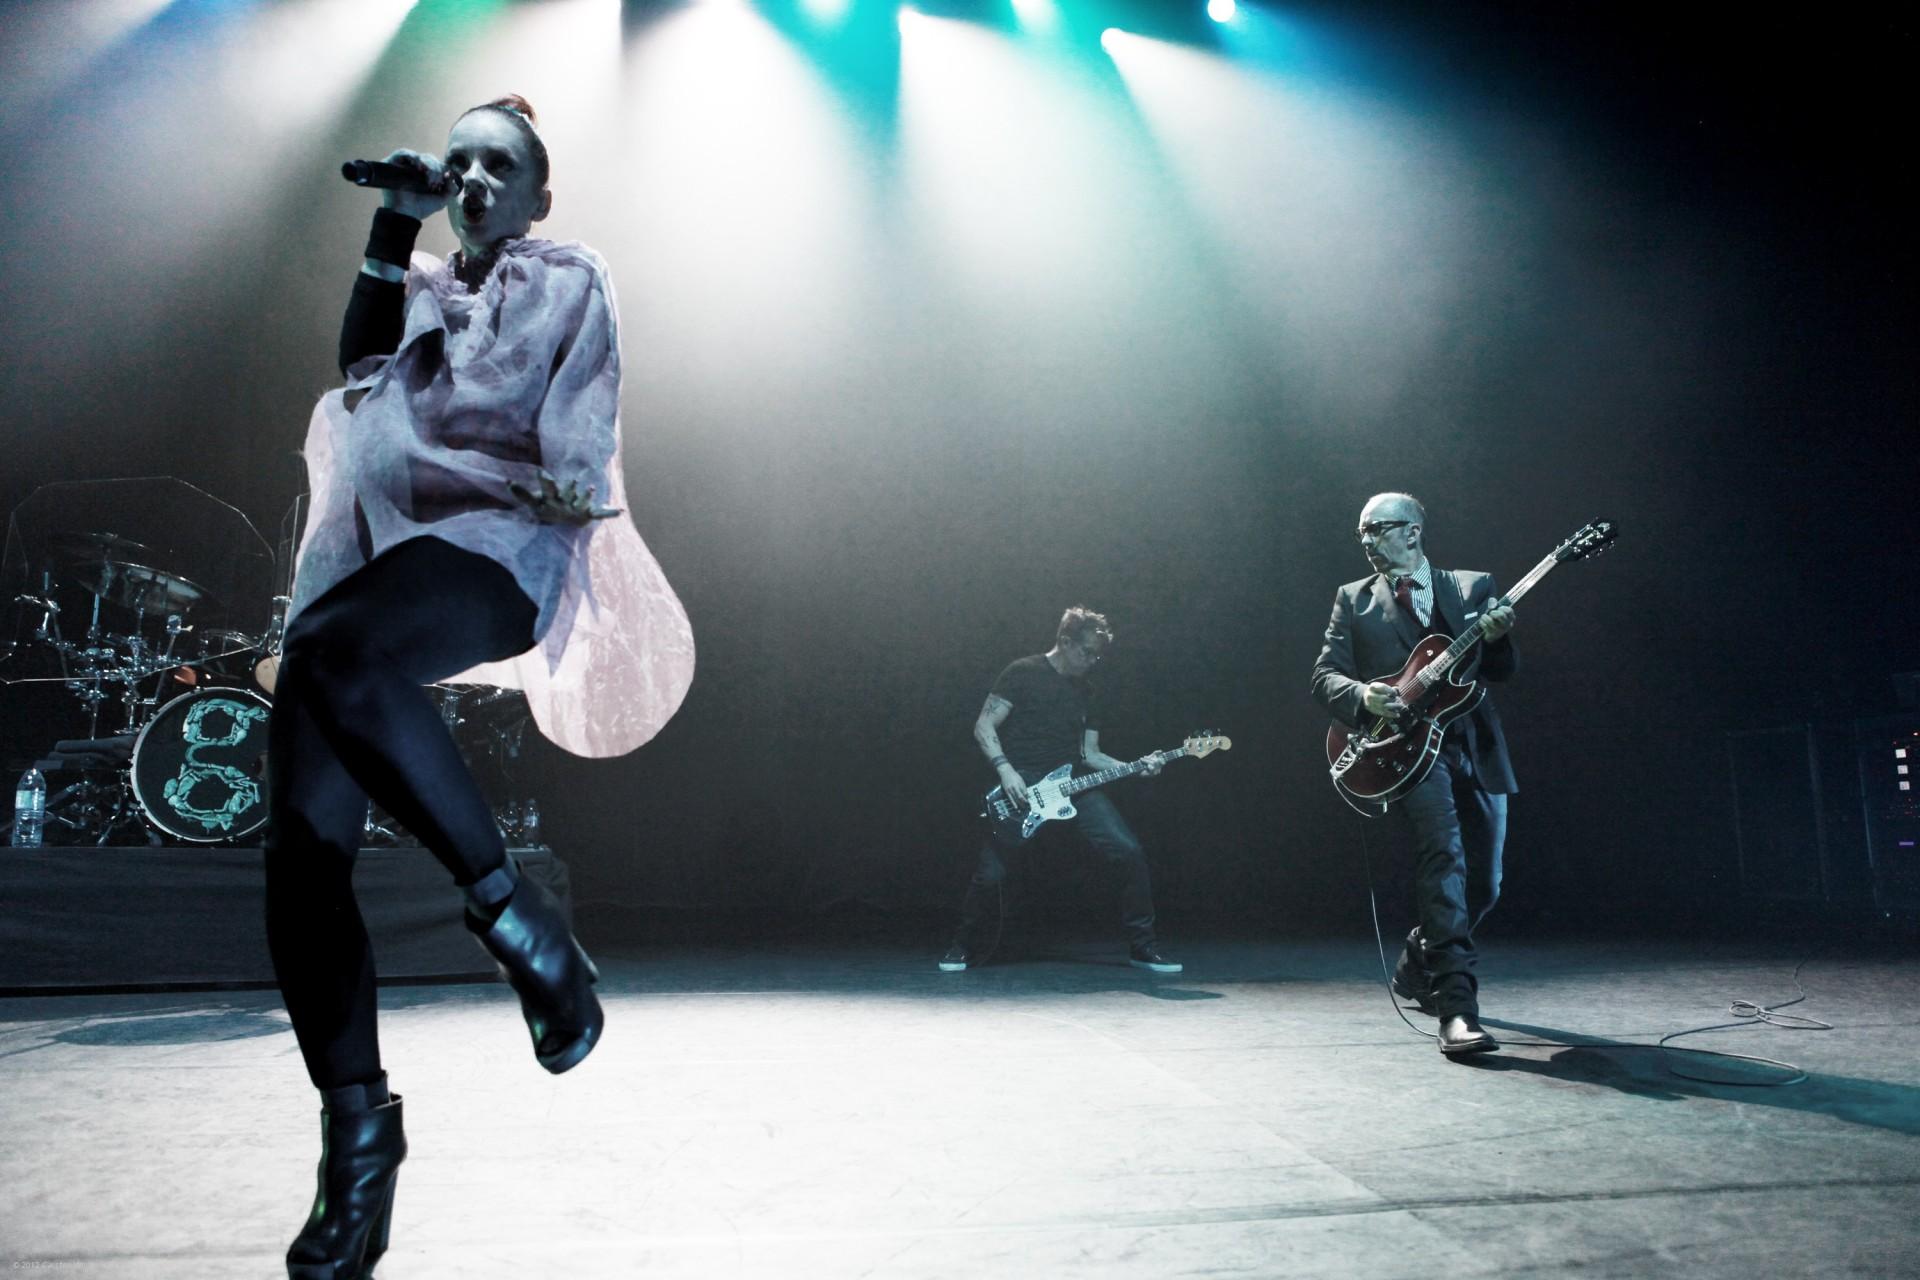 garbage-band stage photographer paris